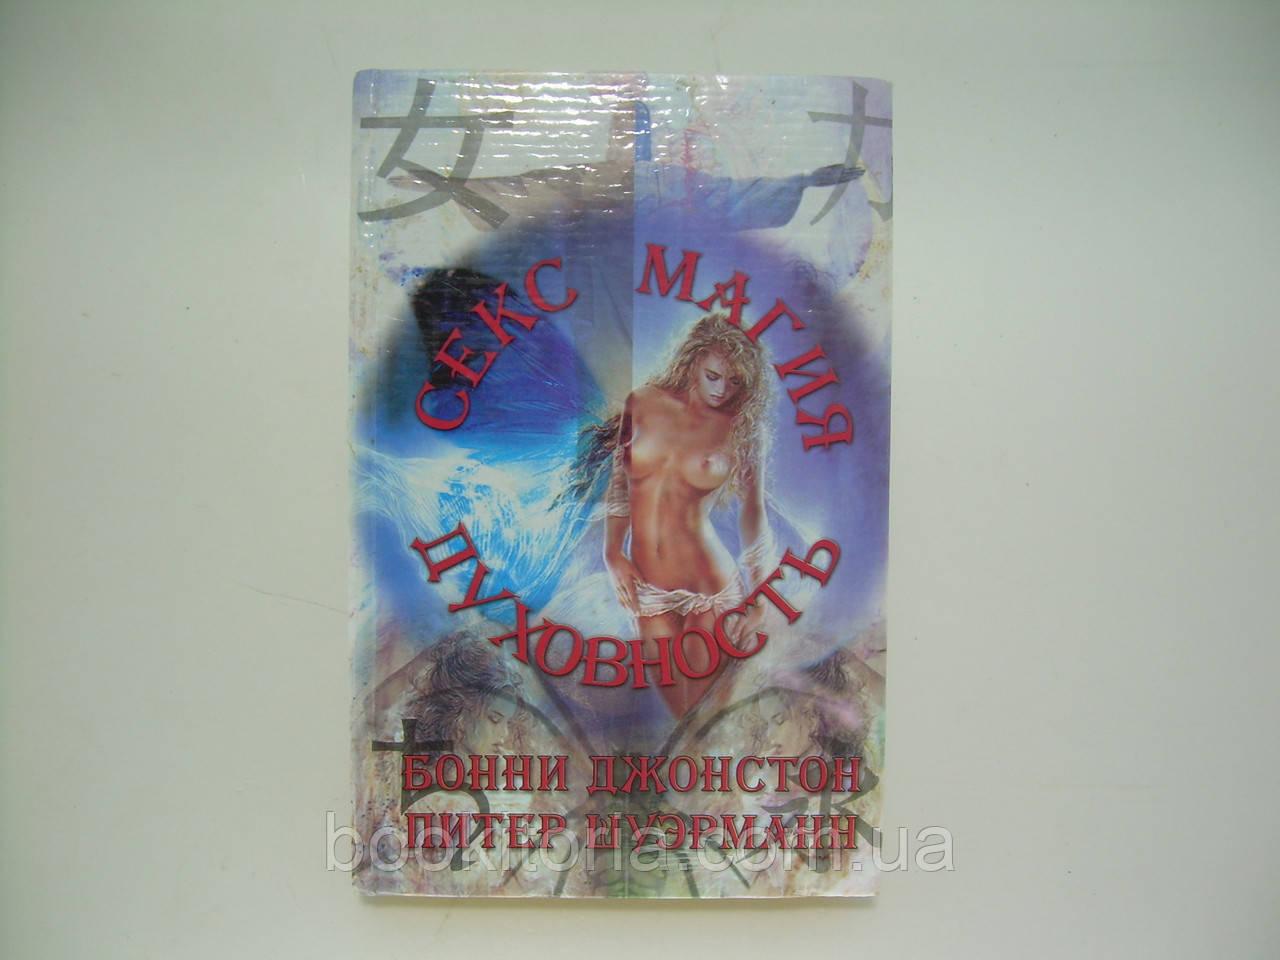 Джонстон Б.Л., Шуэрманн П.Л. Секс, магия, духовность (б/у).